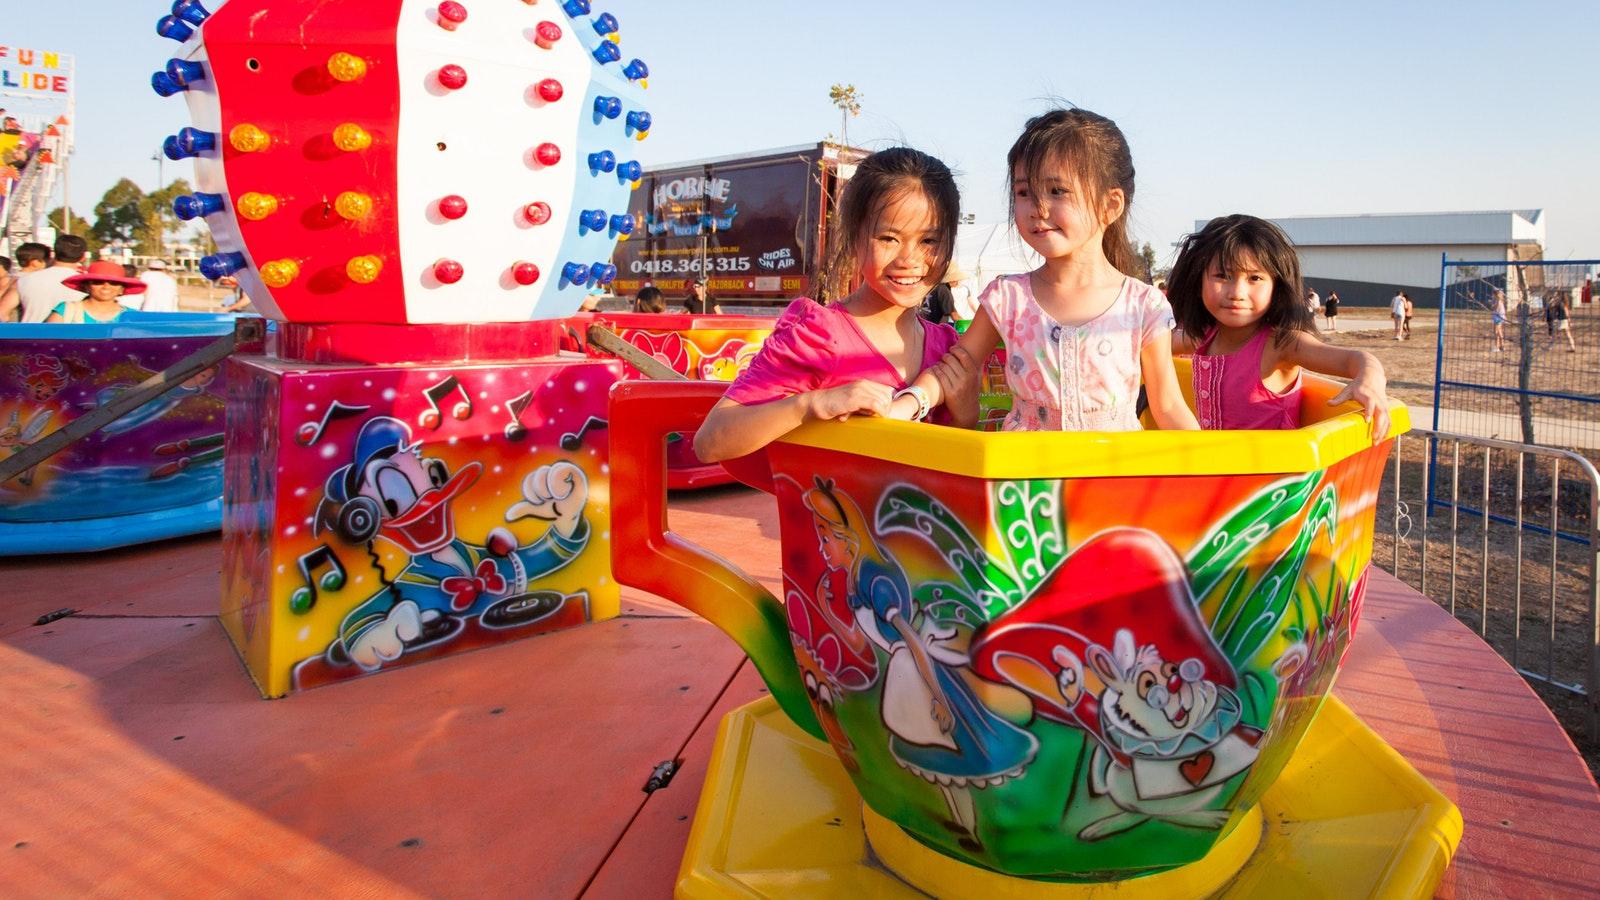 Festivals - children on ride